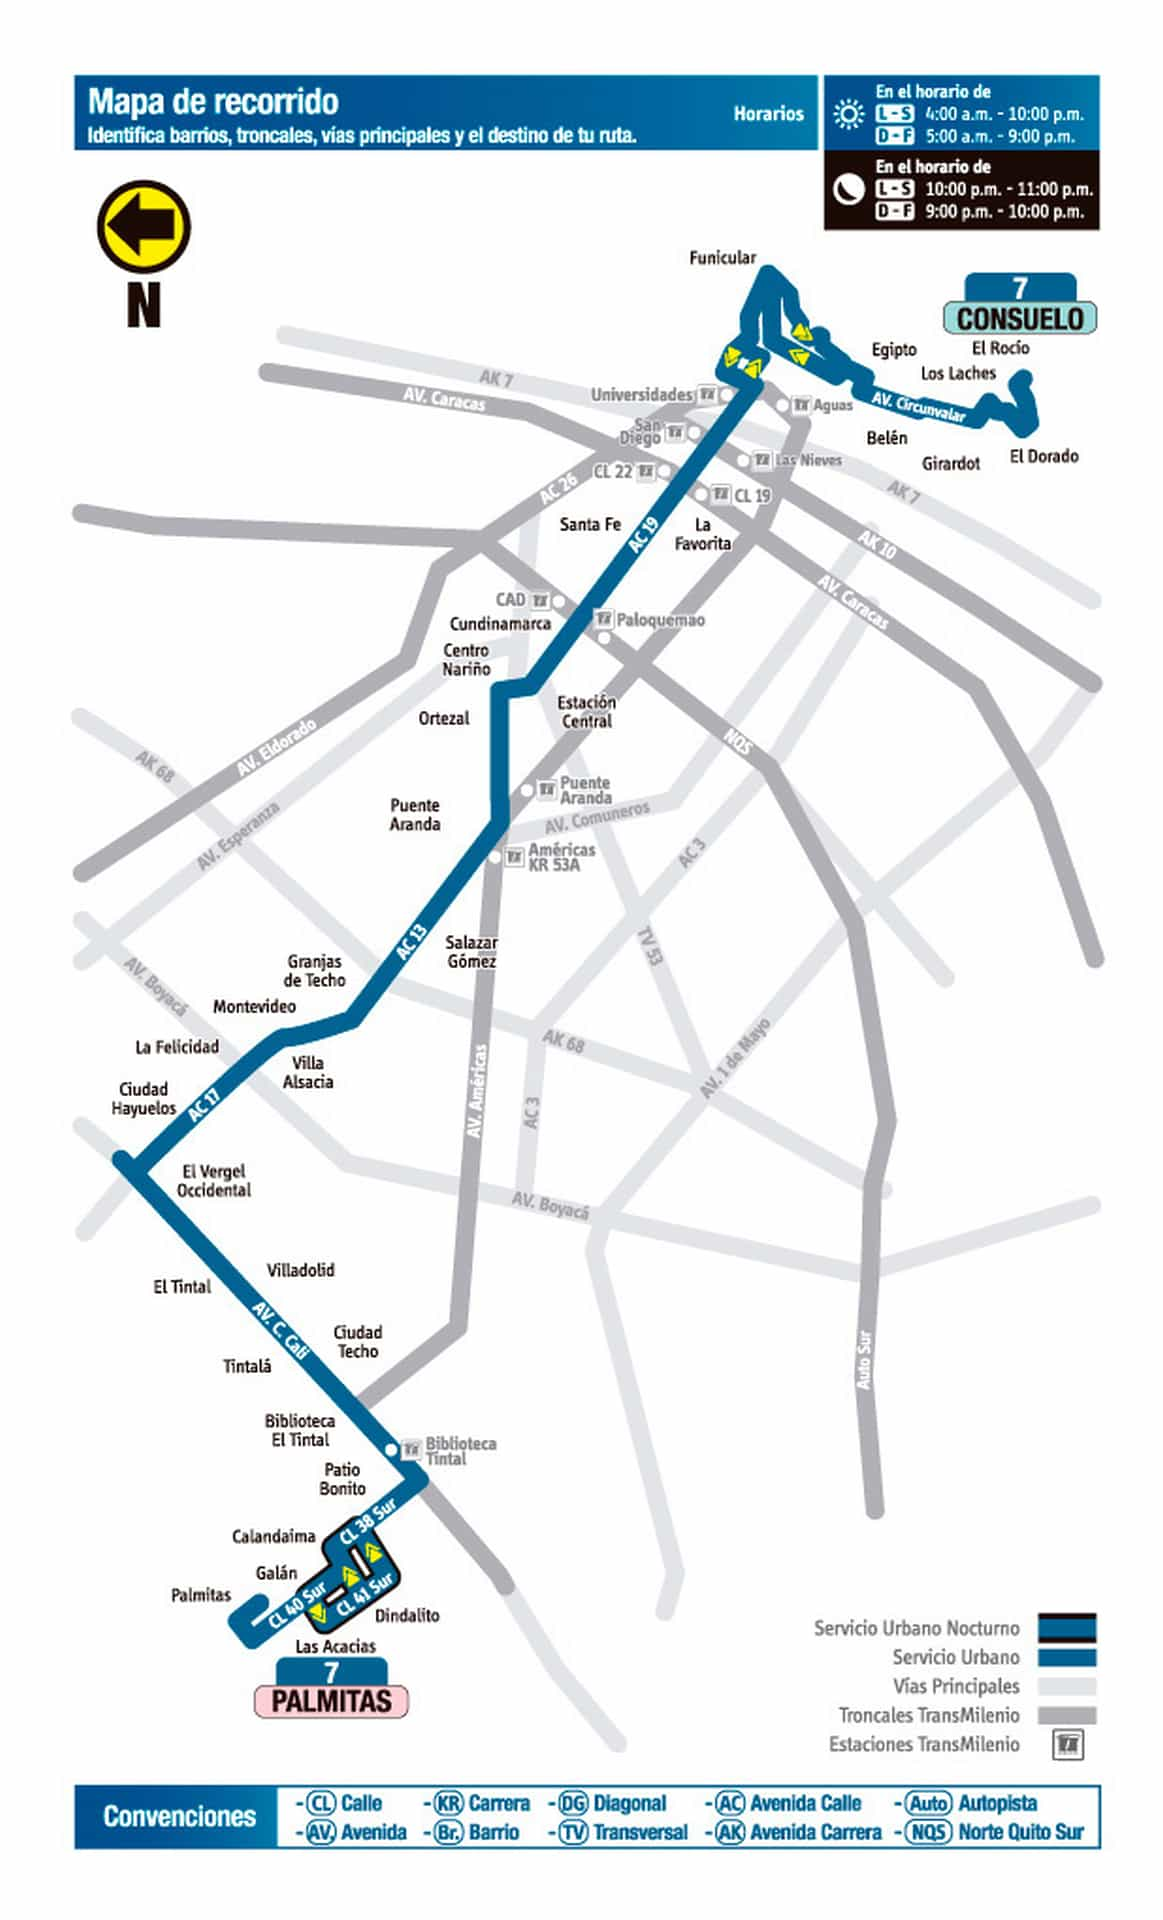 Mapa de recorrido de la ruta urbana: 7 Palmitas - Consuelo